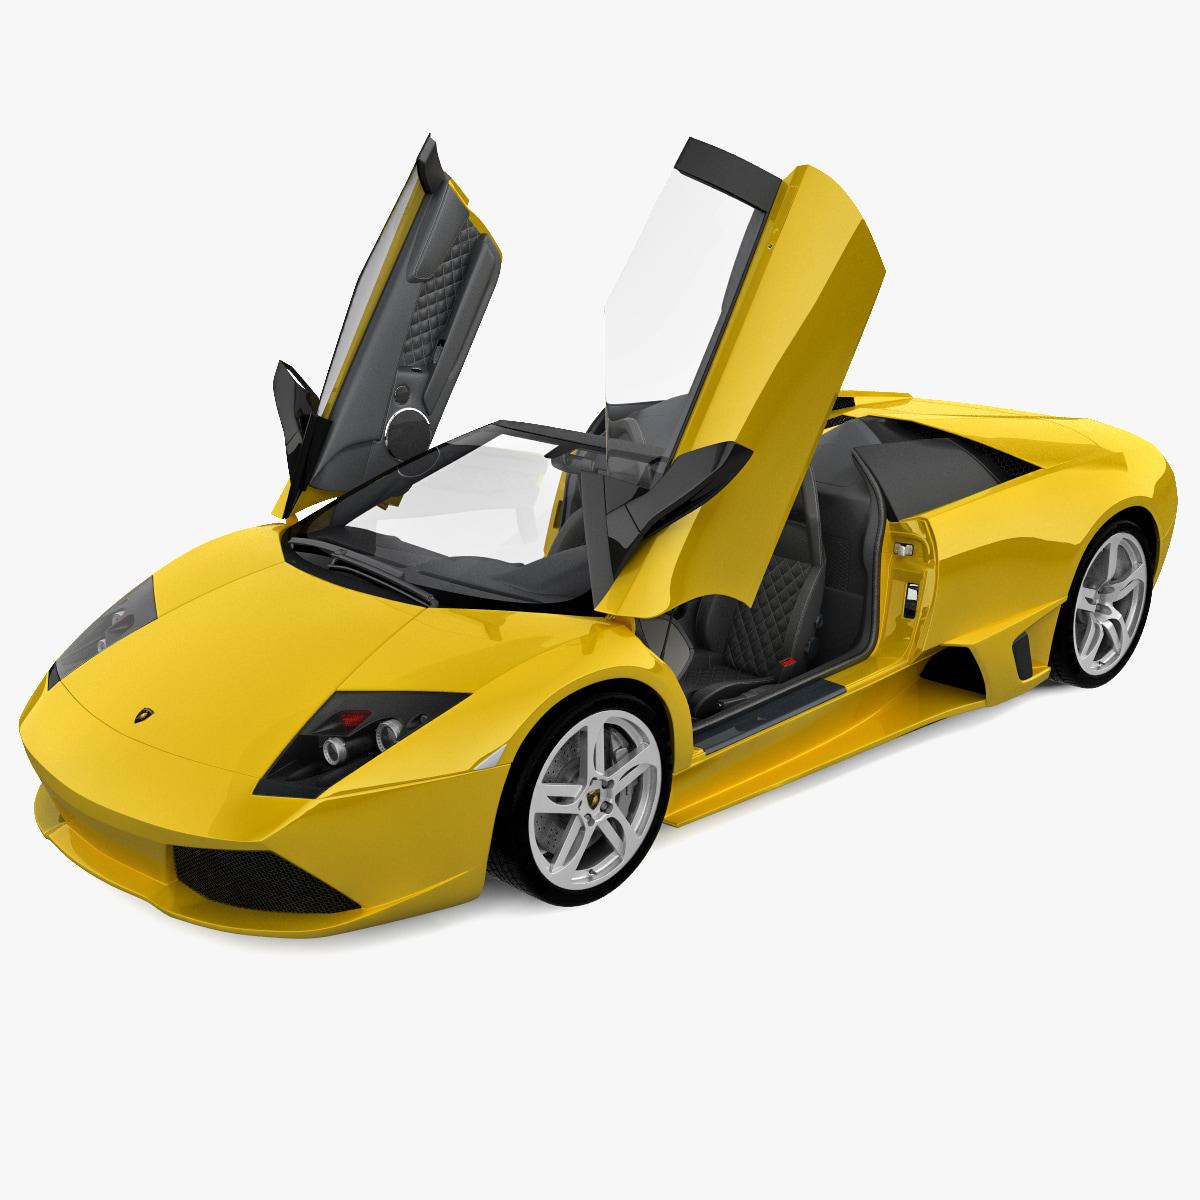 Lamborghini Murcielago: C4d Lamborghini Murcielago Roadster